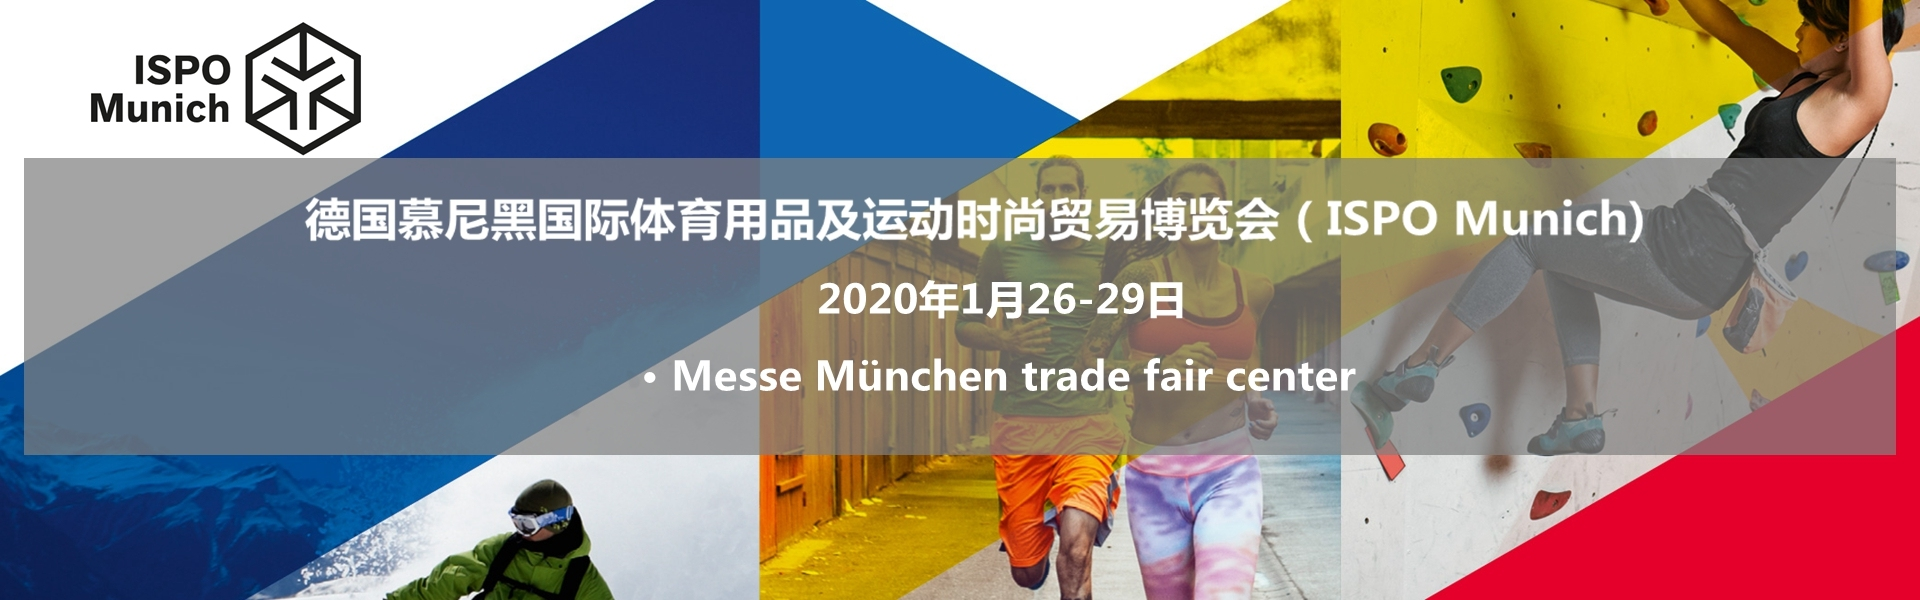 2020年德国慕尼黑ISPO